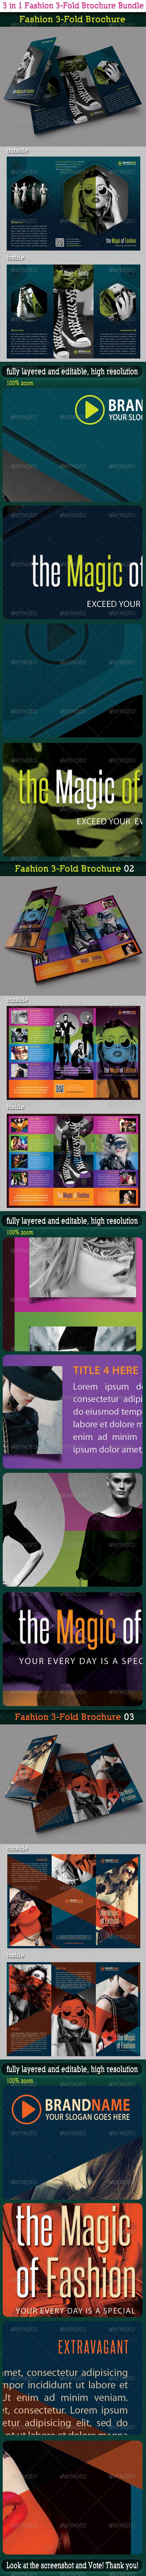 GraphicRiver 3 in 1 Fashion 3-Fold Brochure Bundle 5728390